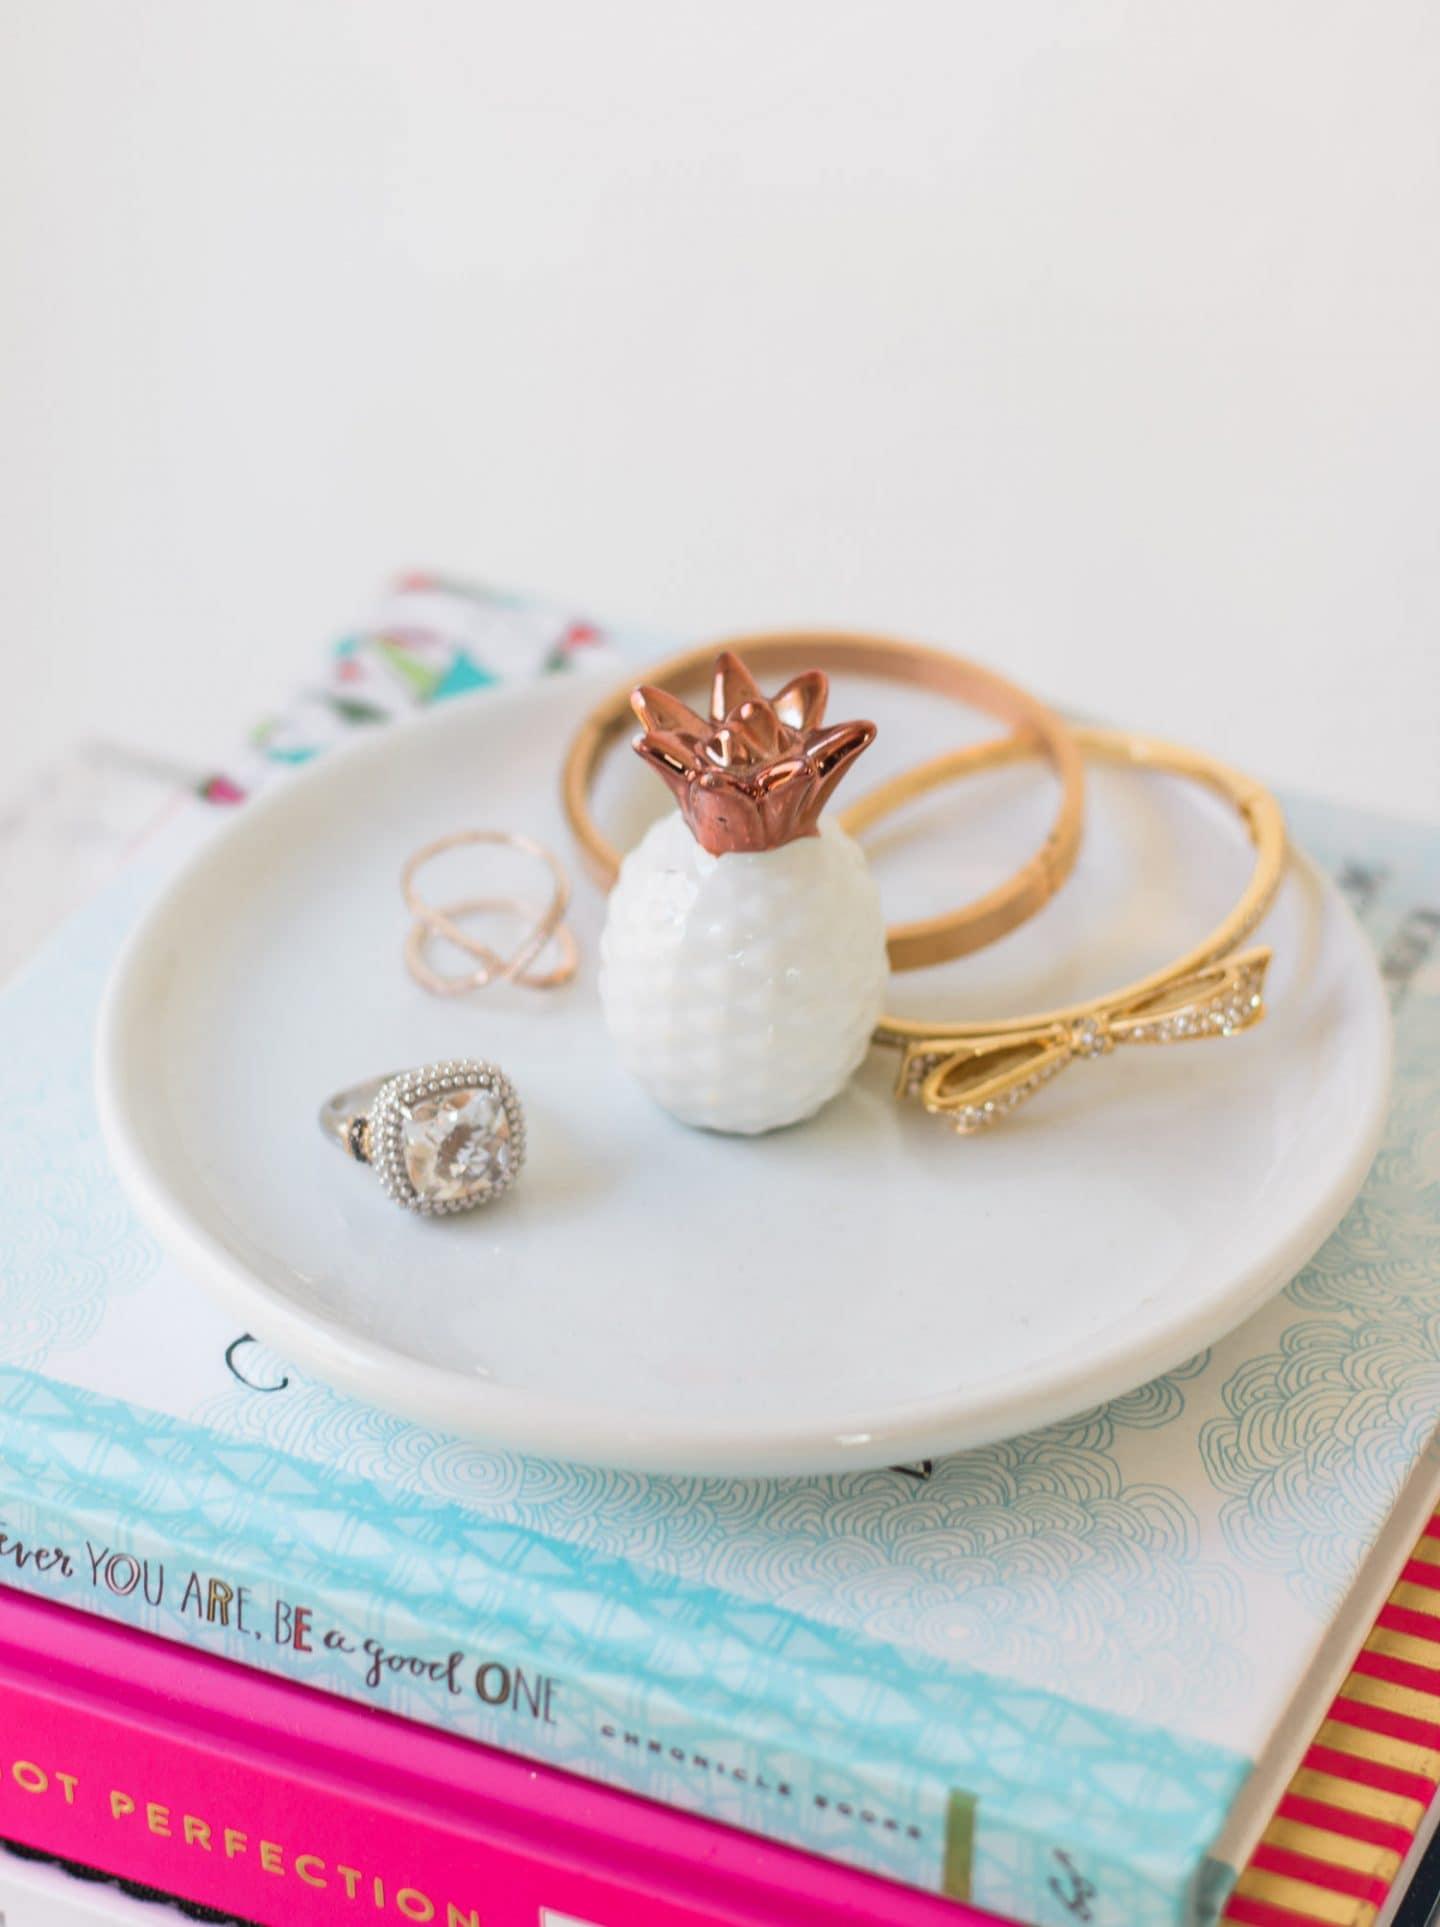 valspar home office tour ashley brooke nicholas cute office inspiration target style jewelry